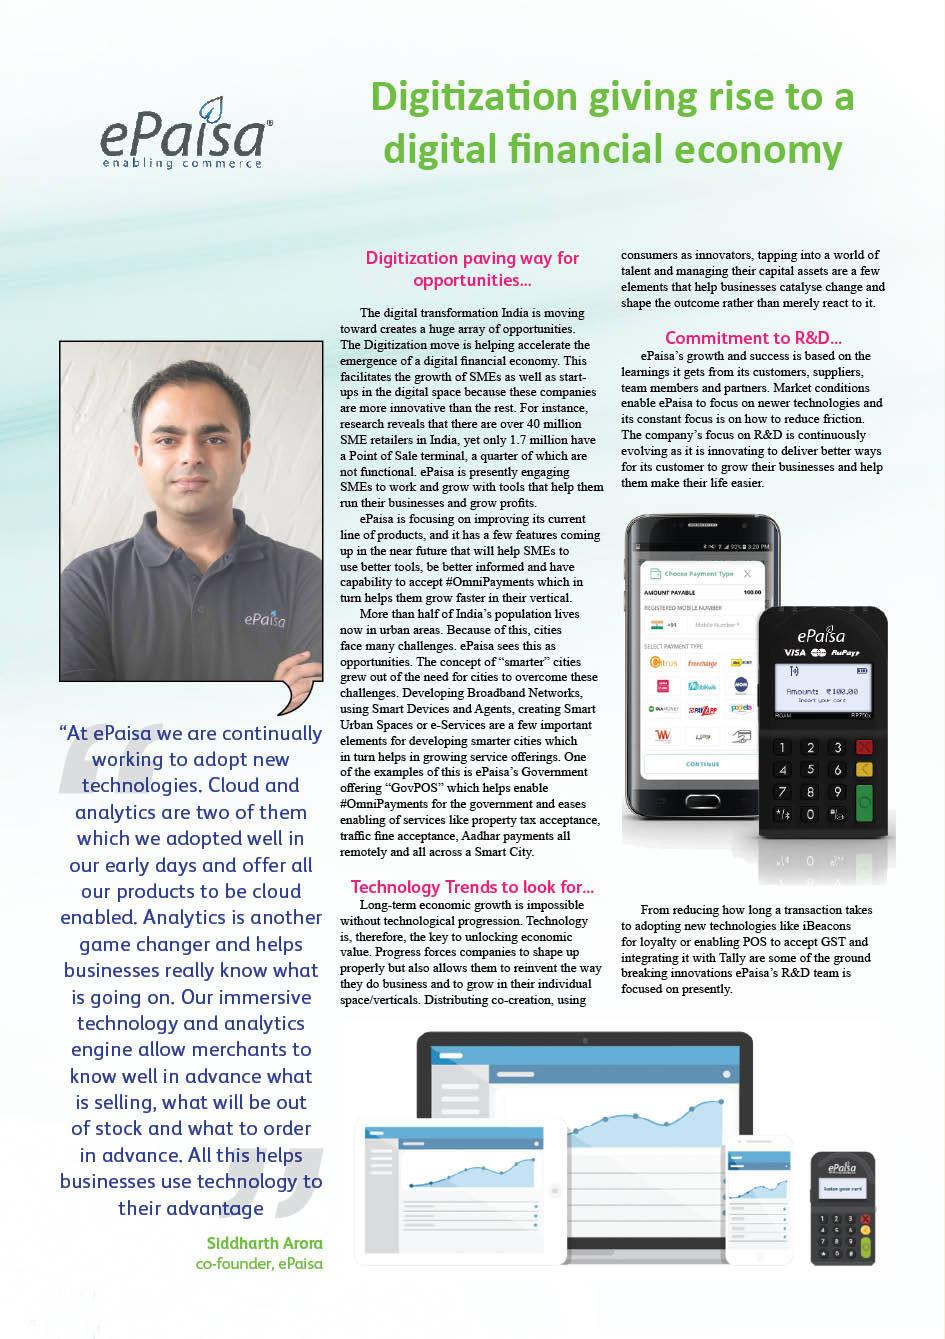 ePaisa: Digitization giving rise to a digital financial economy